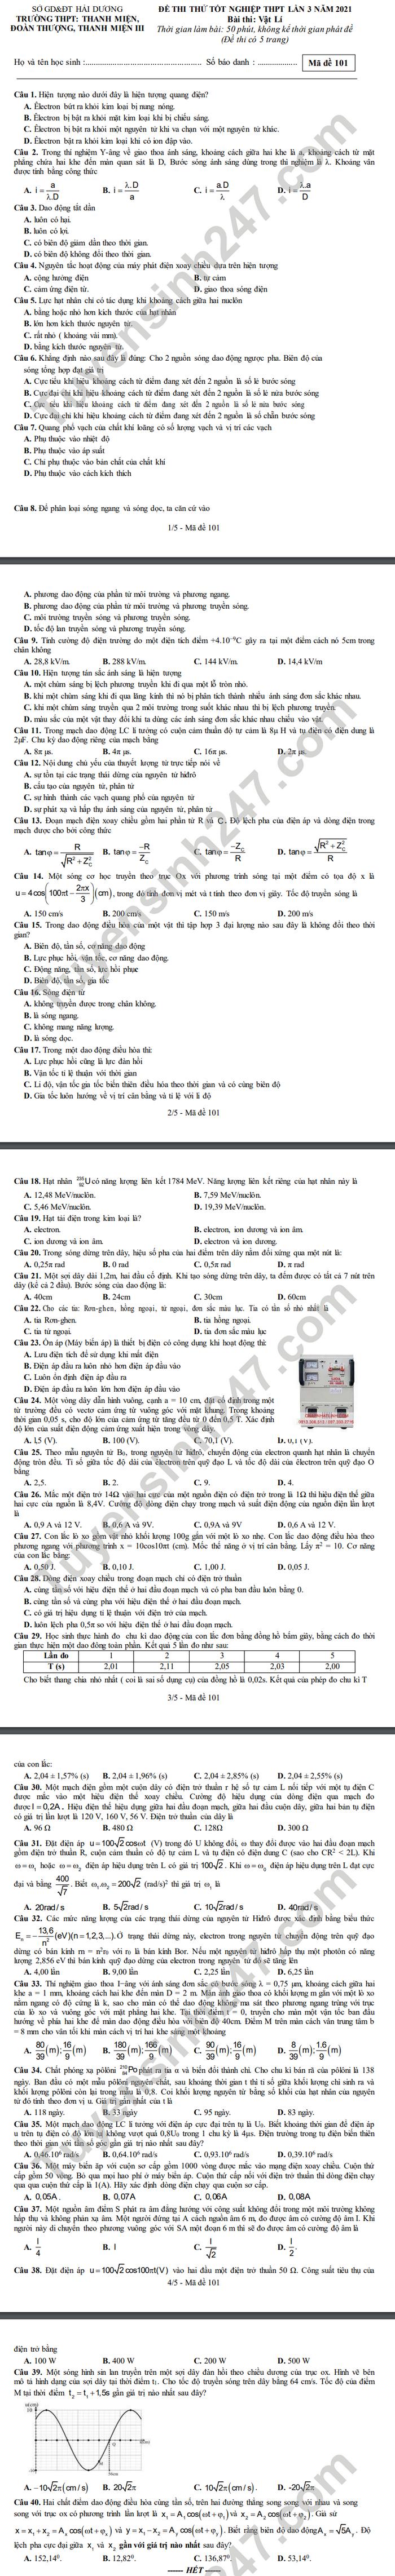 De thi thu tot nghiep THPT 2021 lan 3 mon Ly THPT Thanh Mien-Doan Thuong